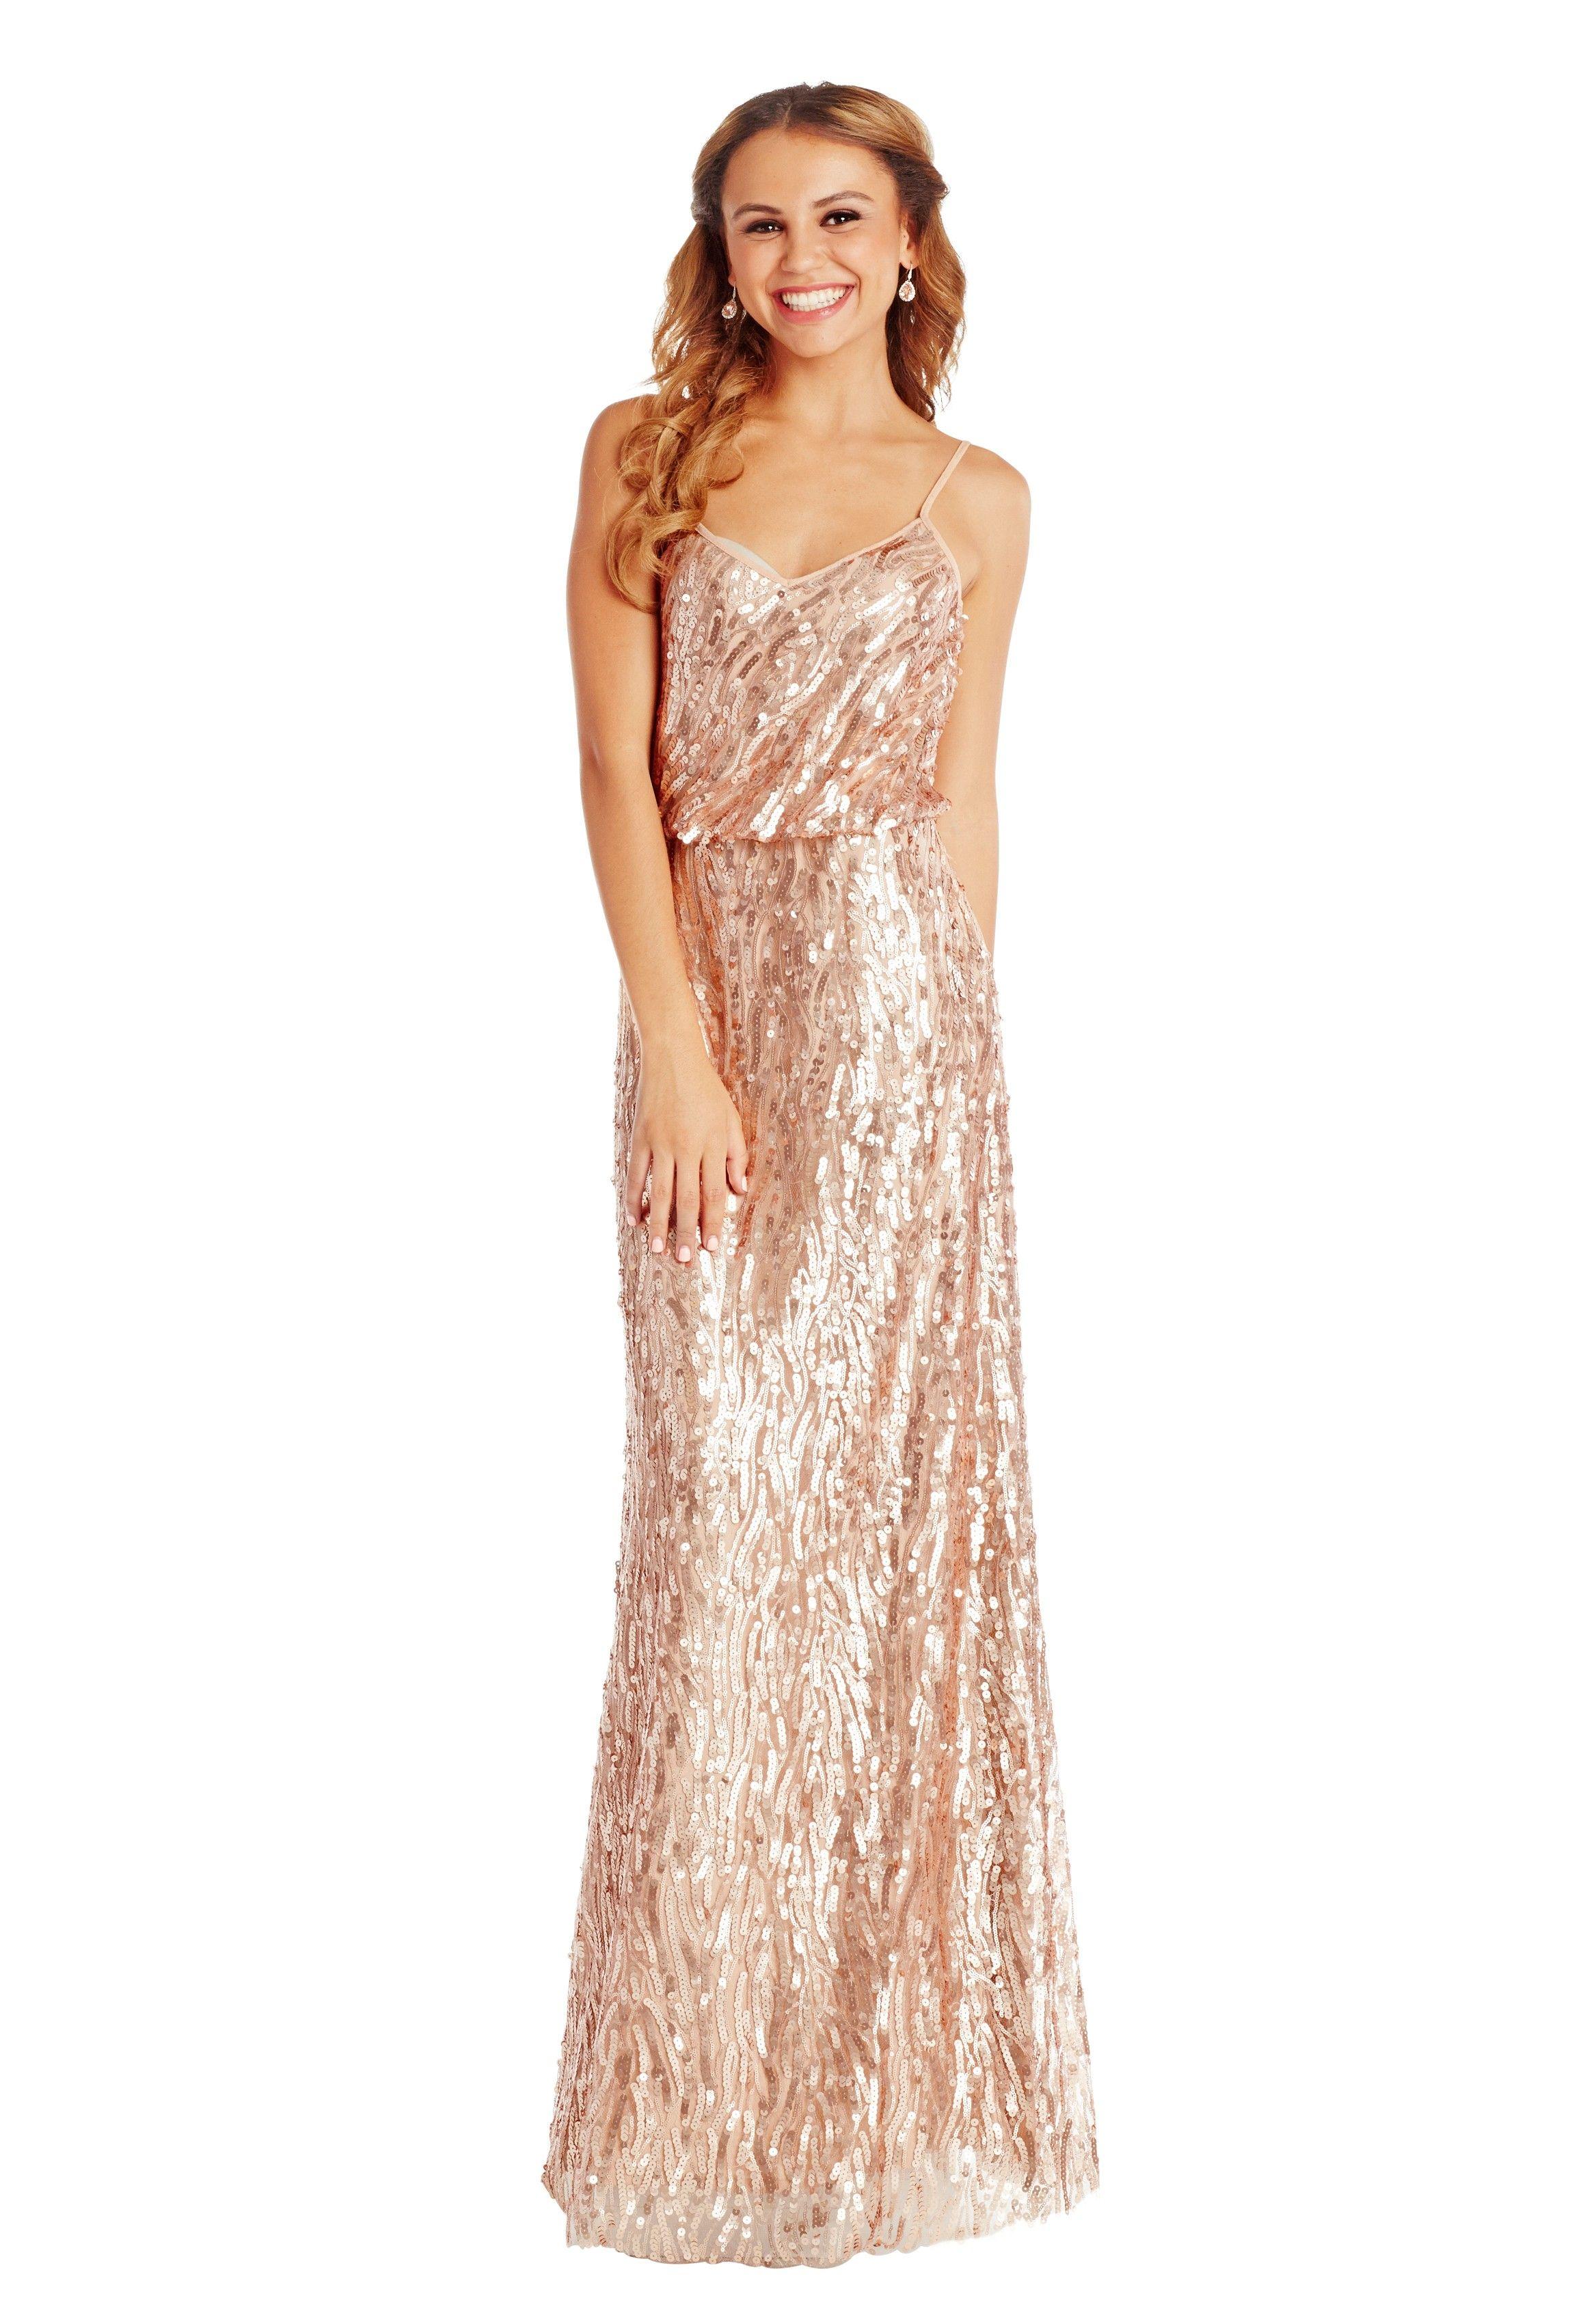 288469e8669 A floor-length sequin bridesmaid dress with a strappy top